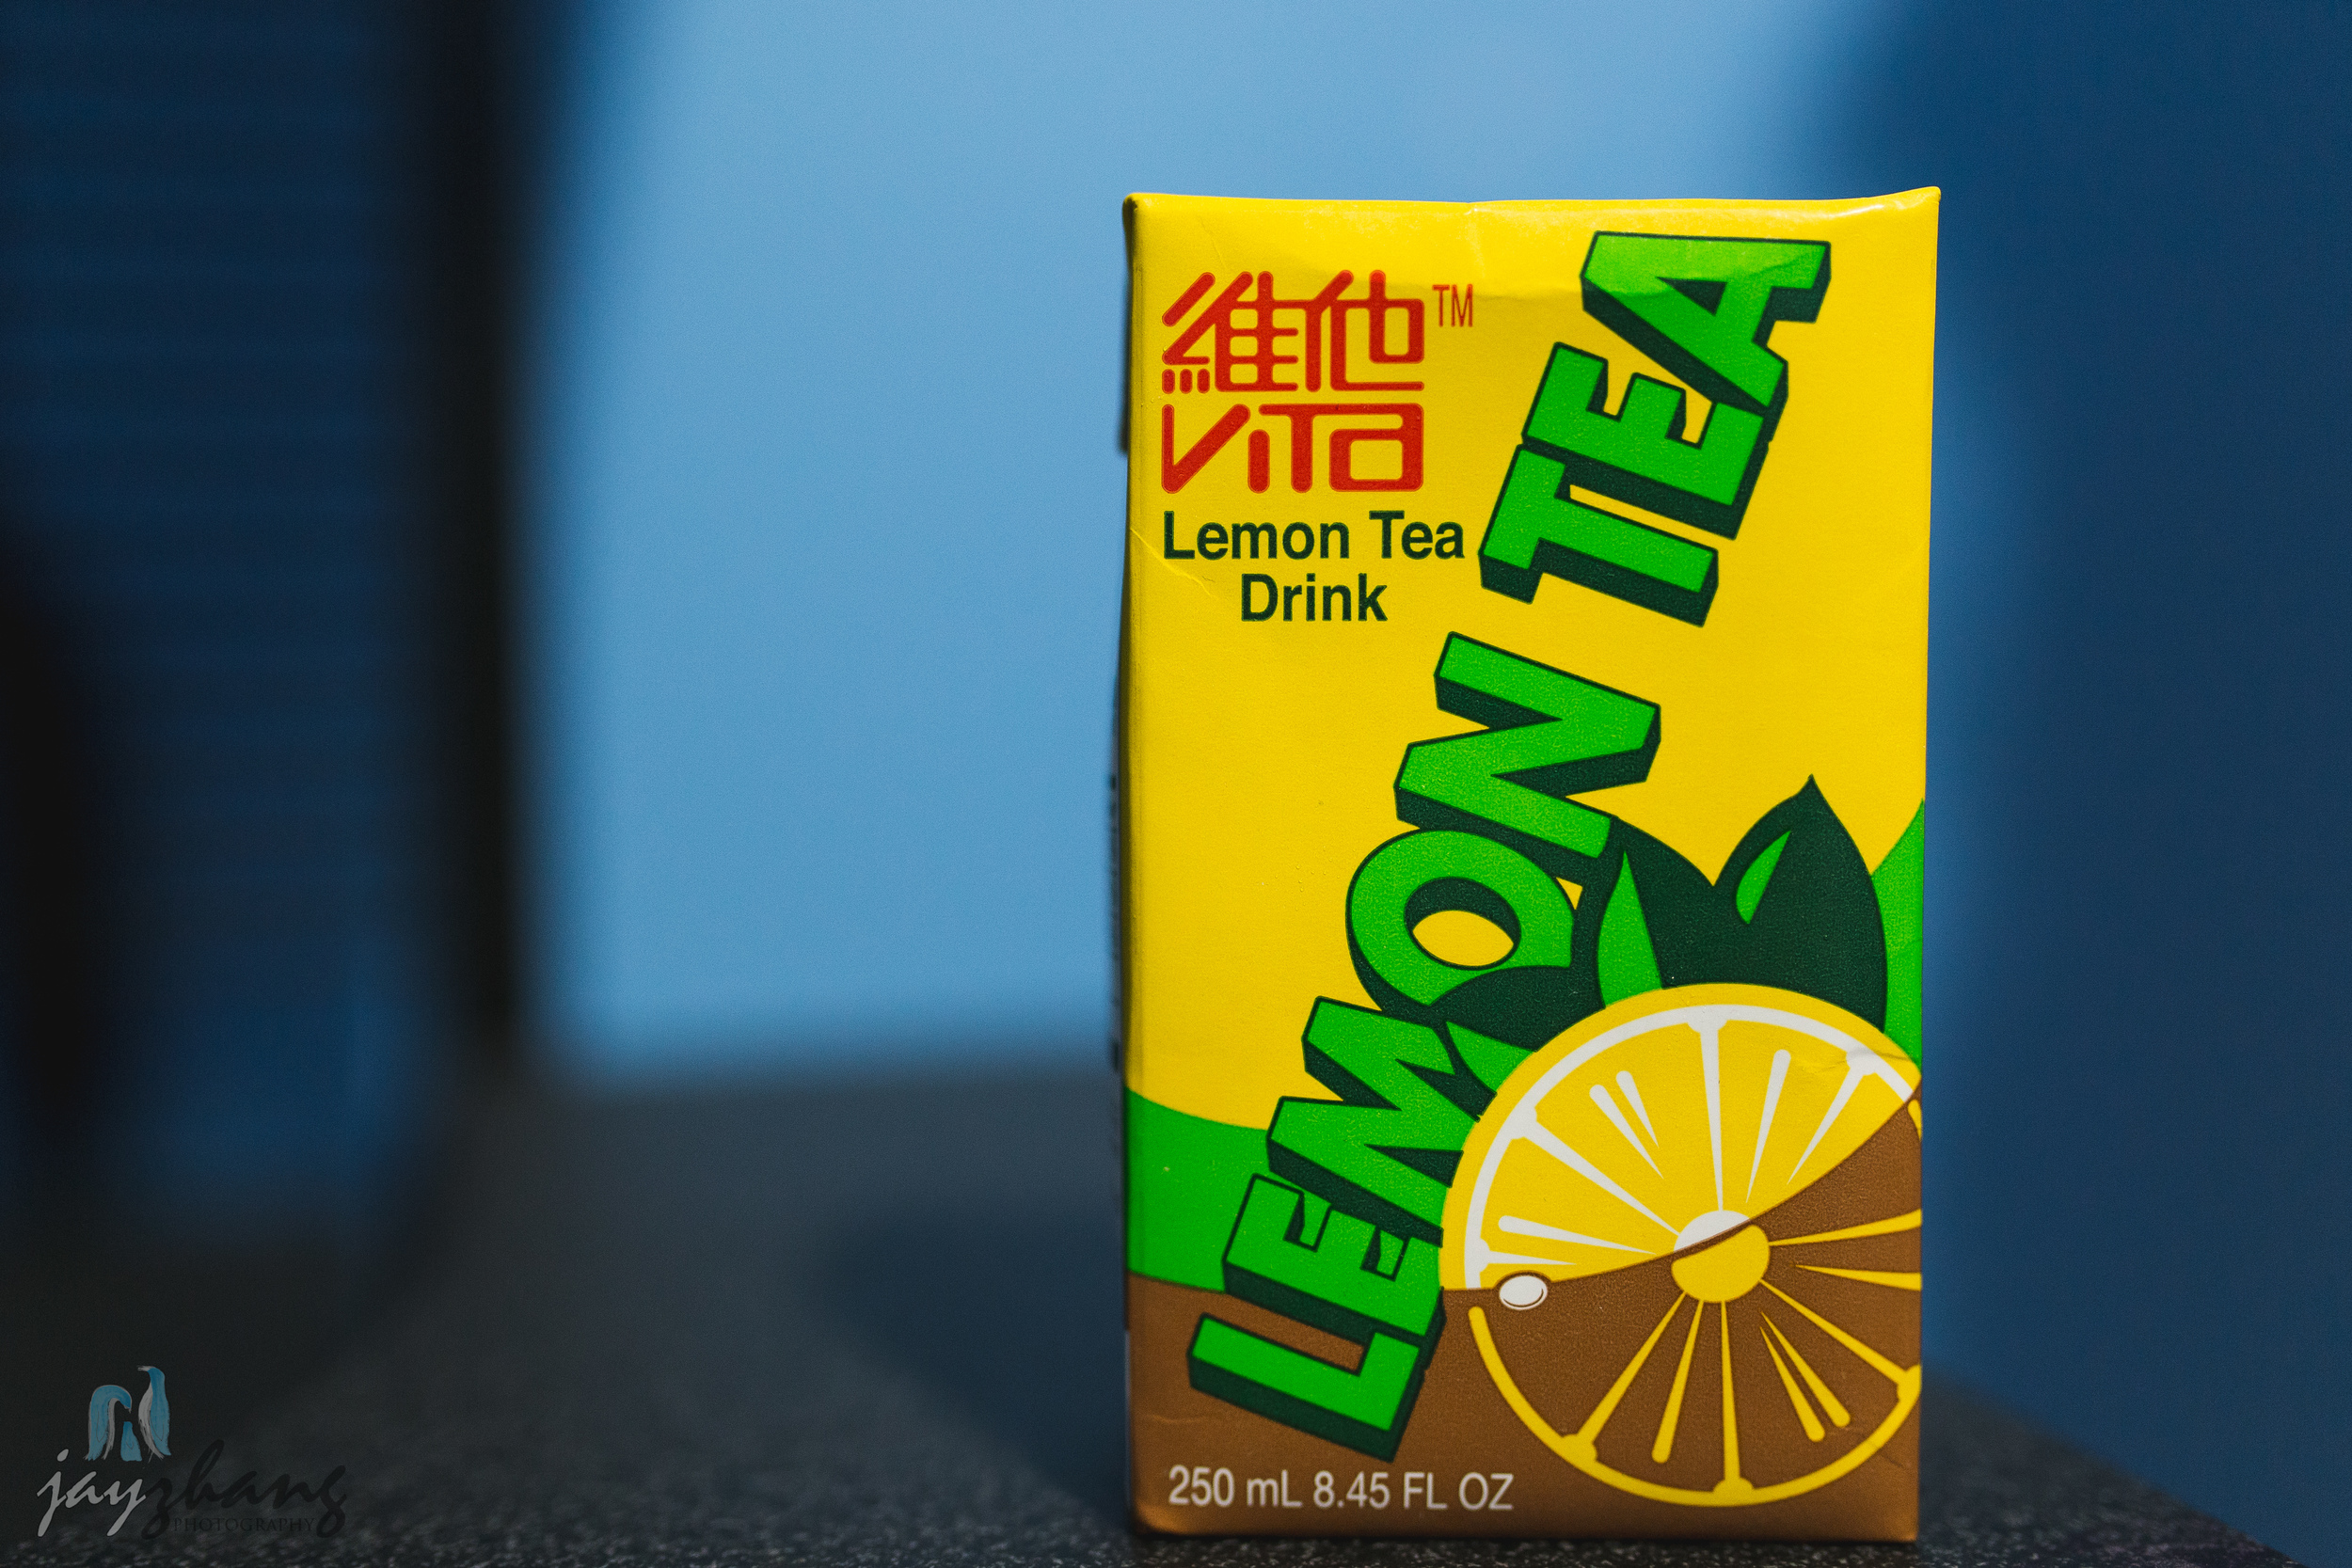 Day 178 - Lemon Tea